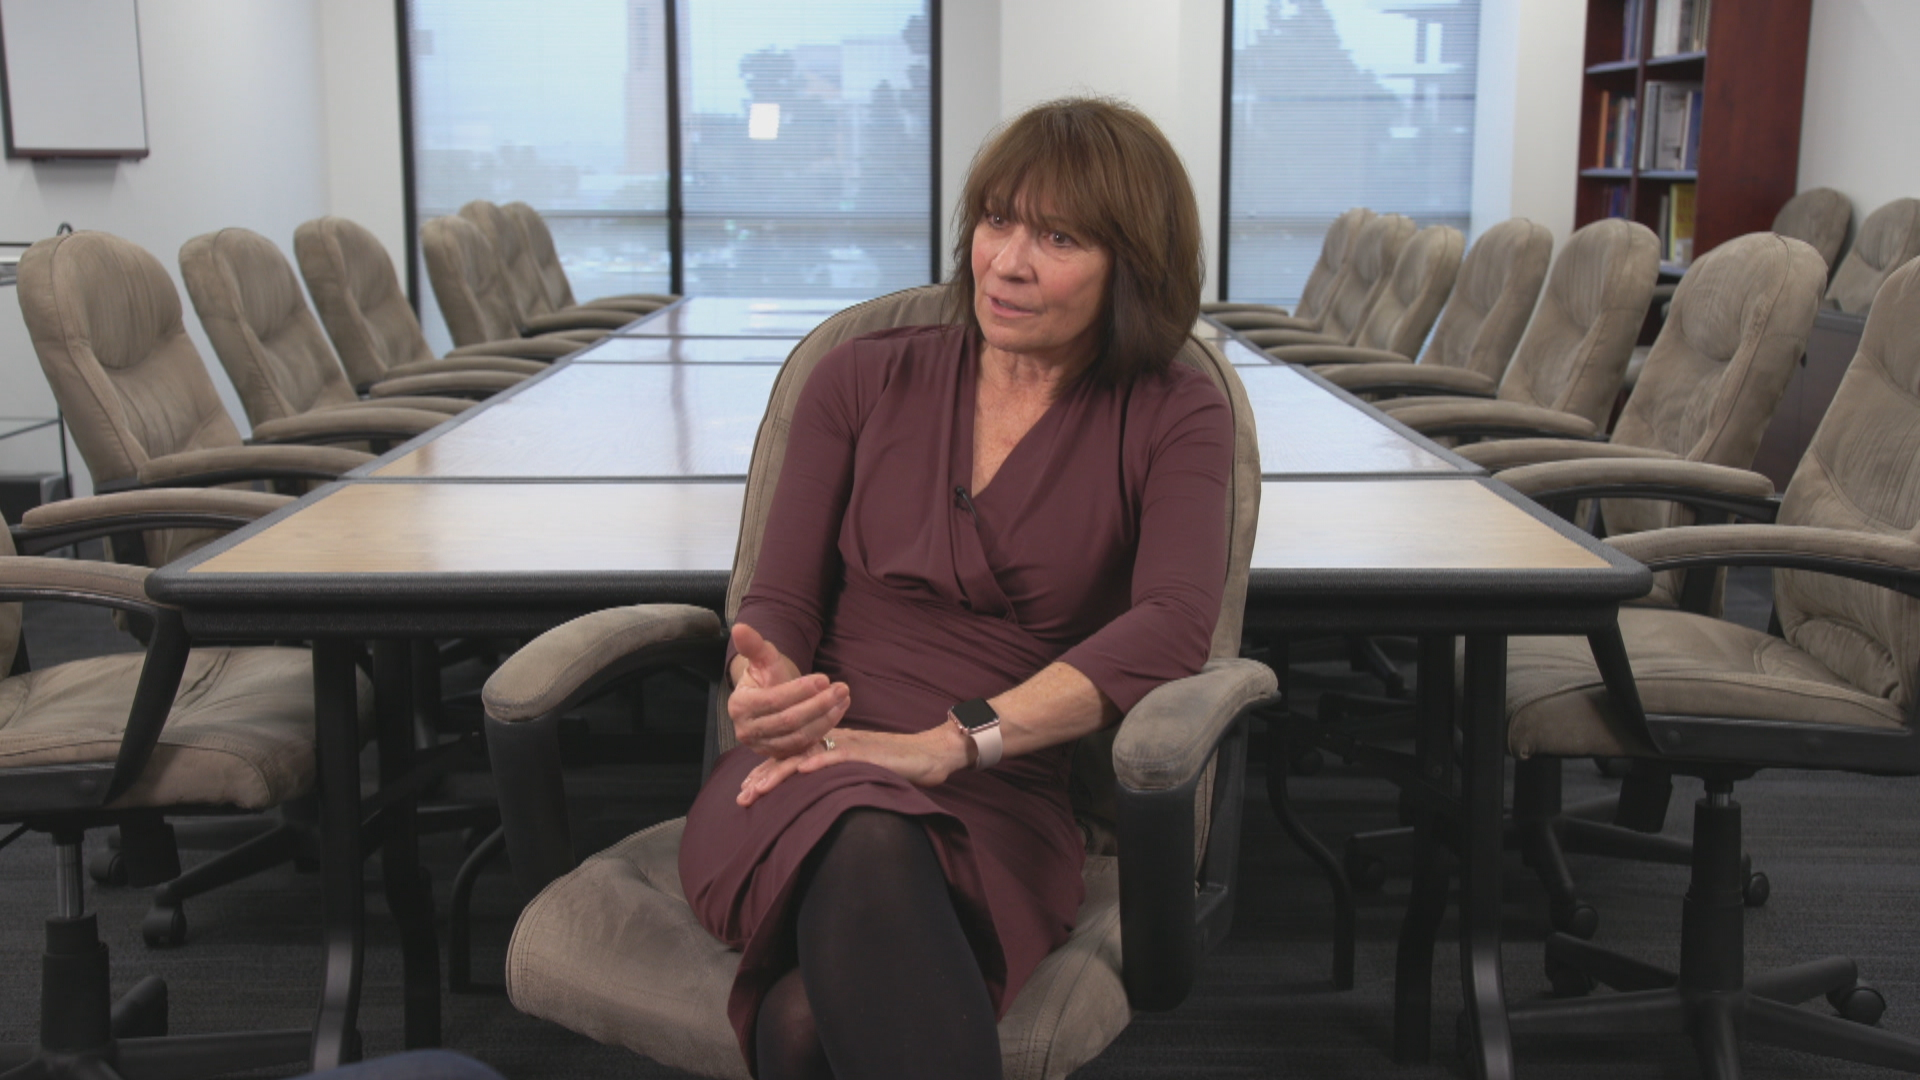 Psychologist Denise Jablonski-Kaye is one of 16 staff psychologists at the LAPD behavioral science service unit. (John Badcock/CBC)